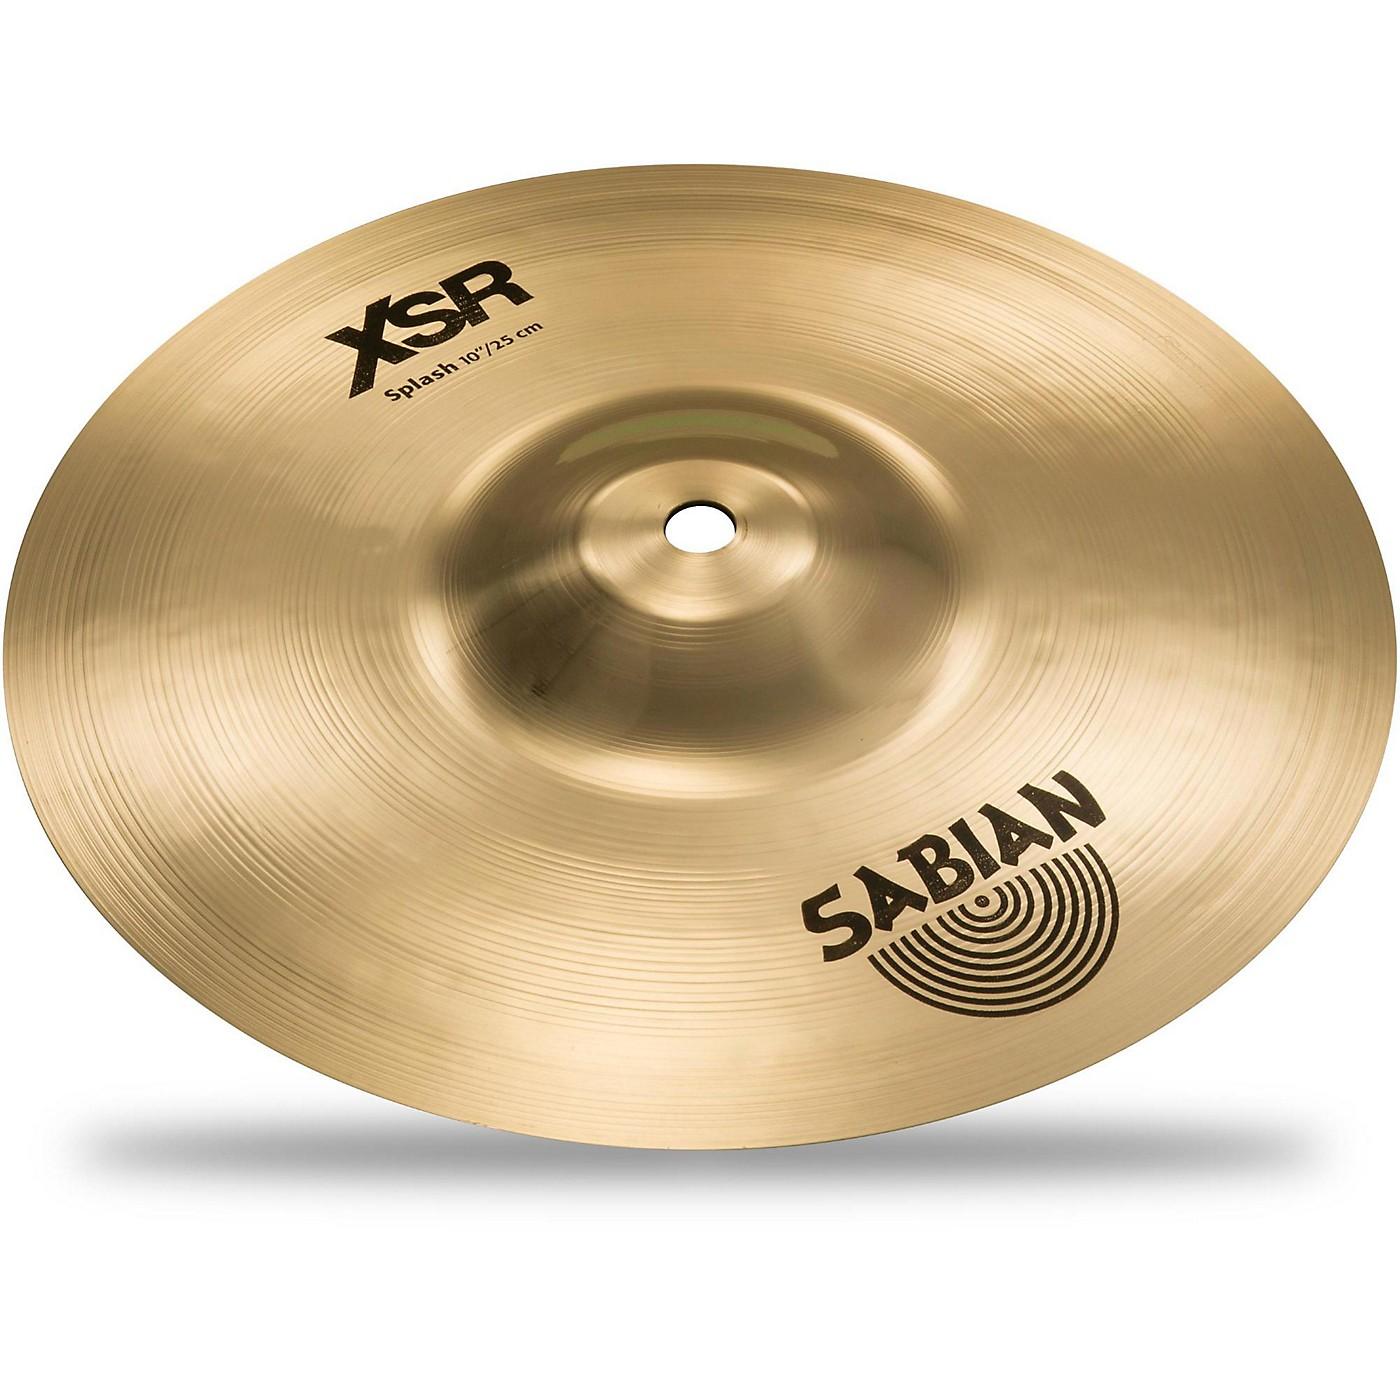 Sabian XSR Series Splash Cymbal thumbnail